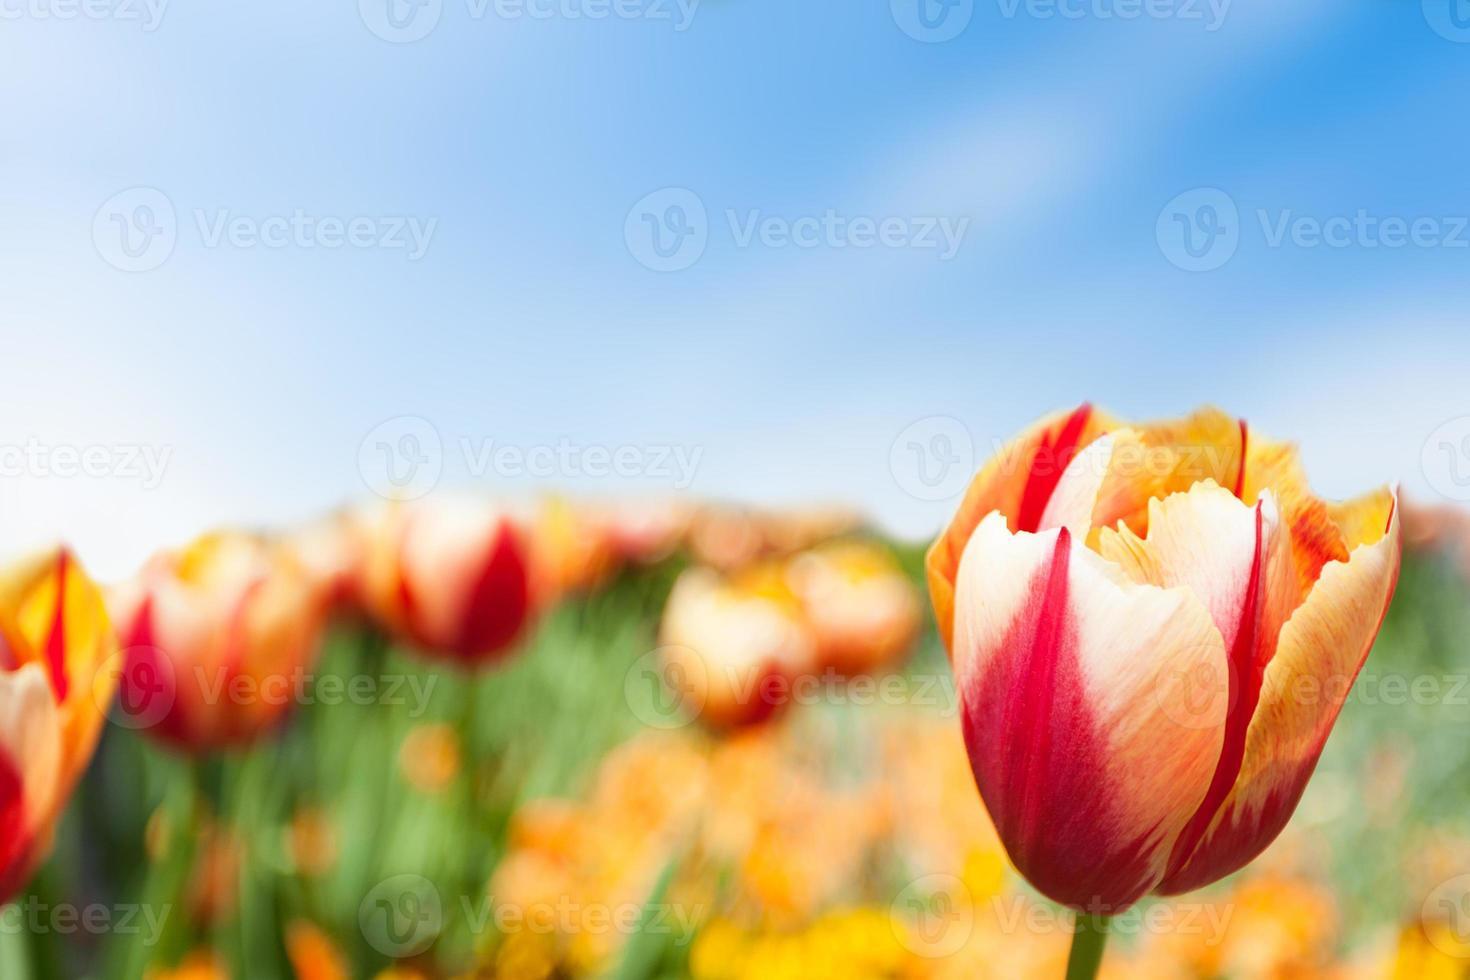 rood gele tulp foto